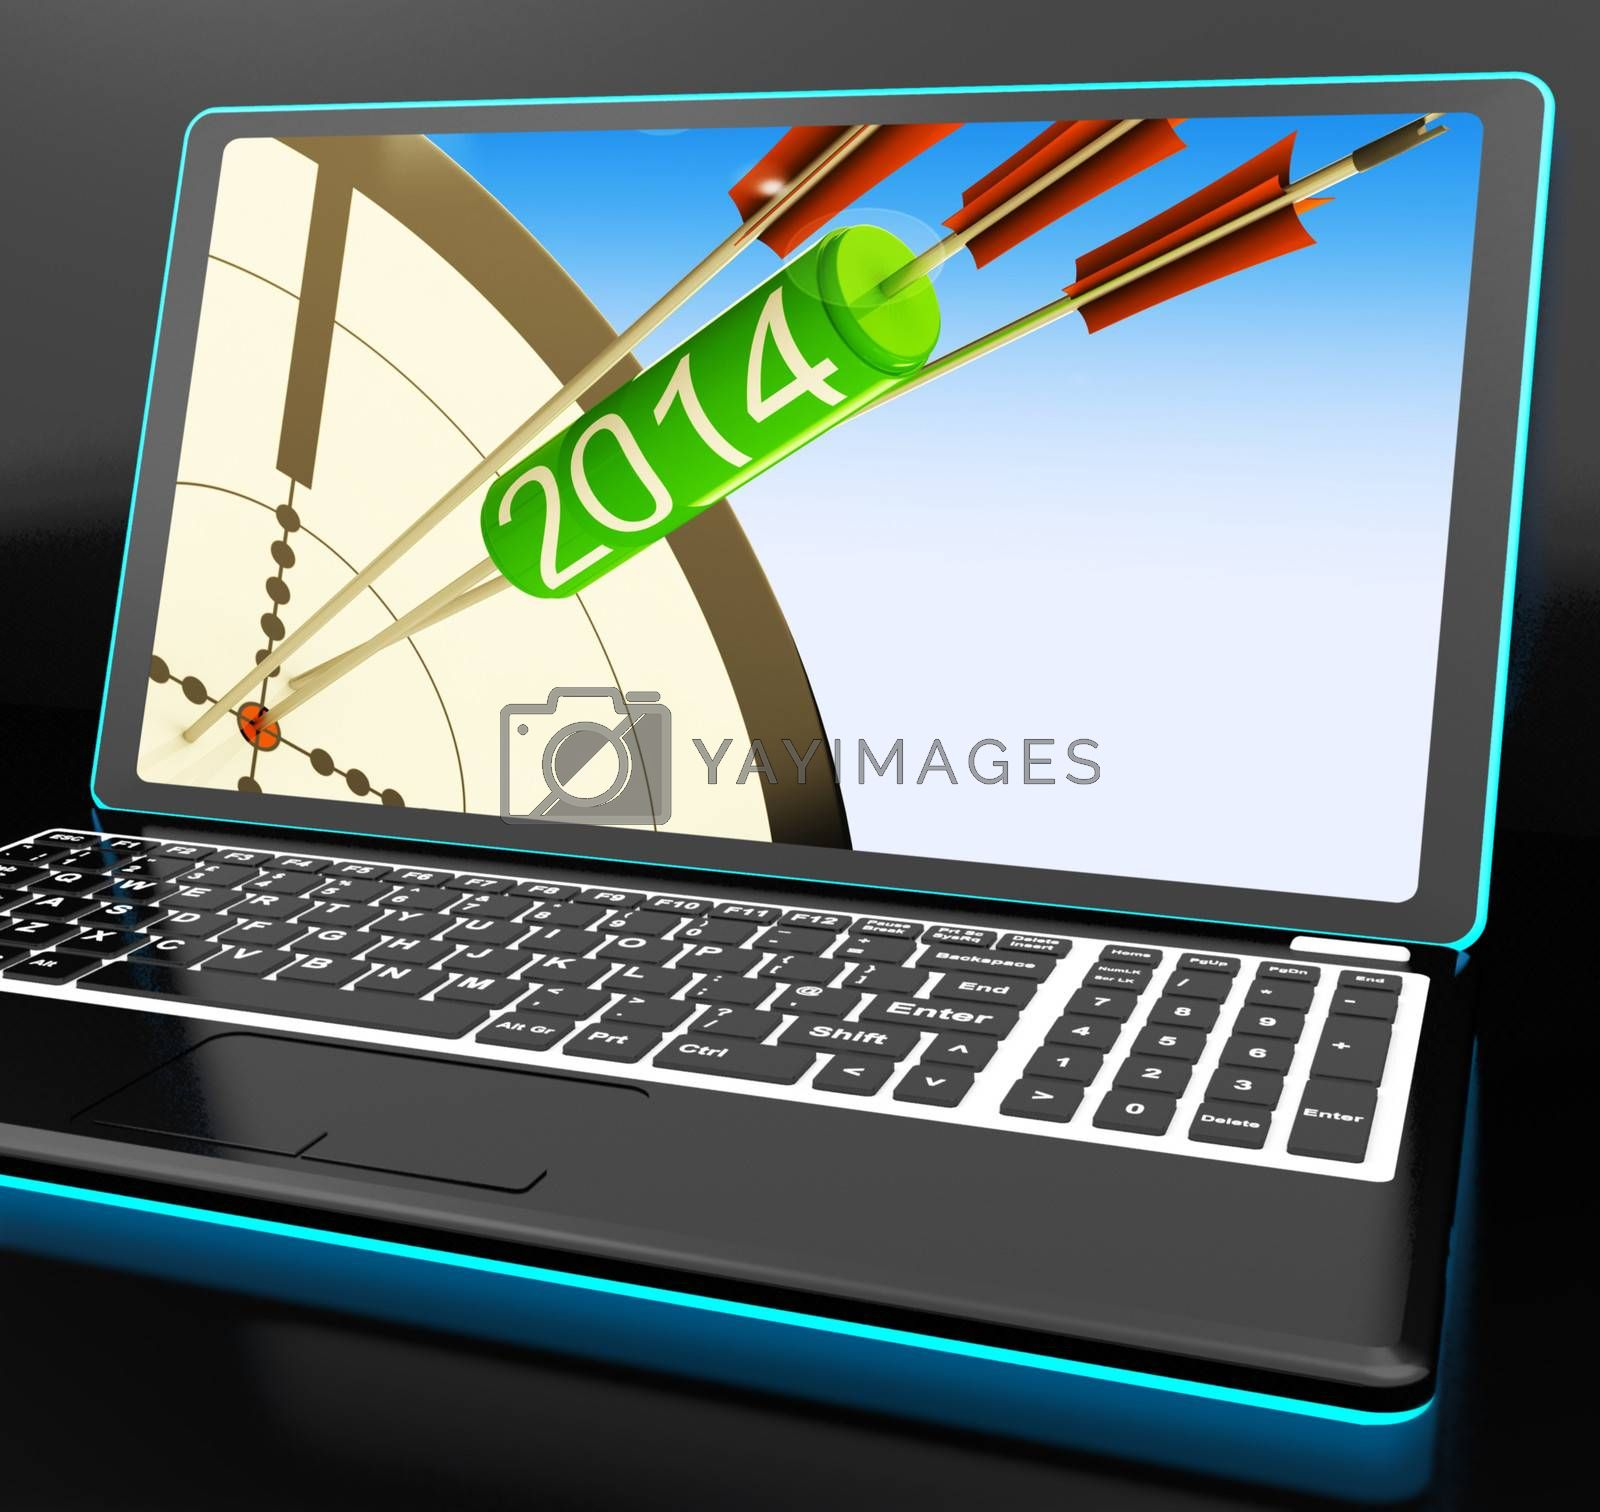 2014 Arrows On Laptop Showing Festivities by stuartmiles